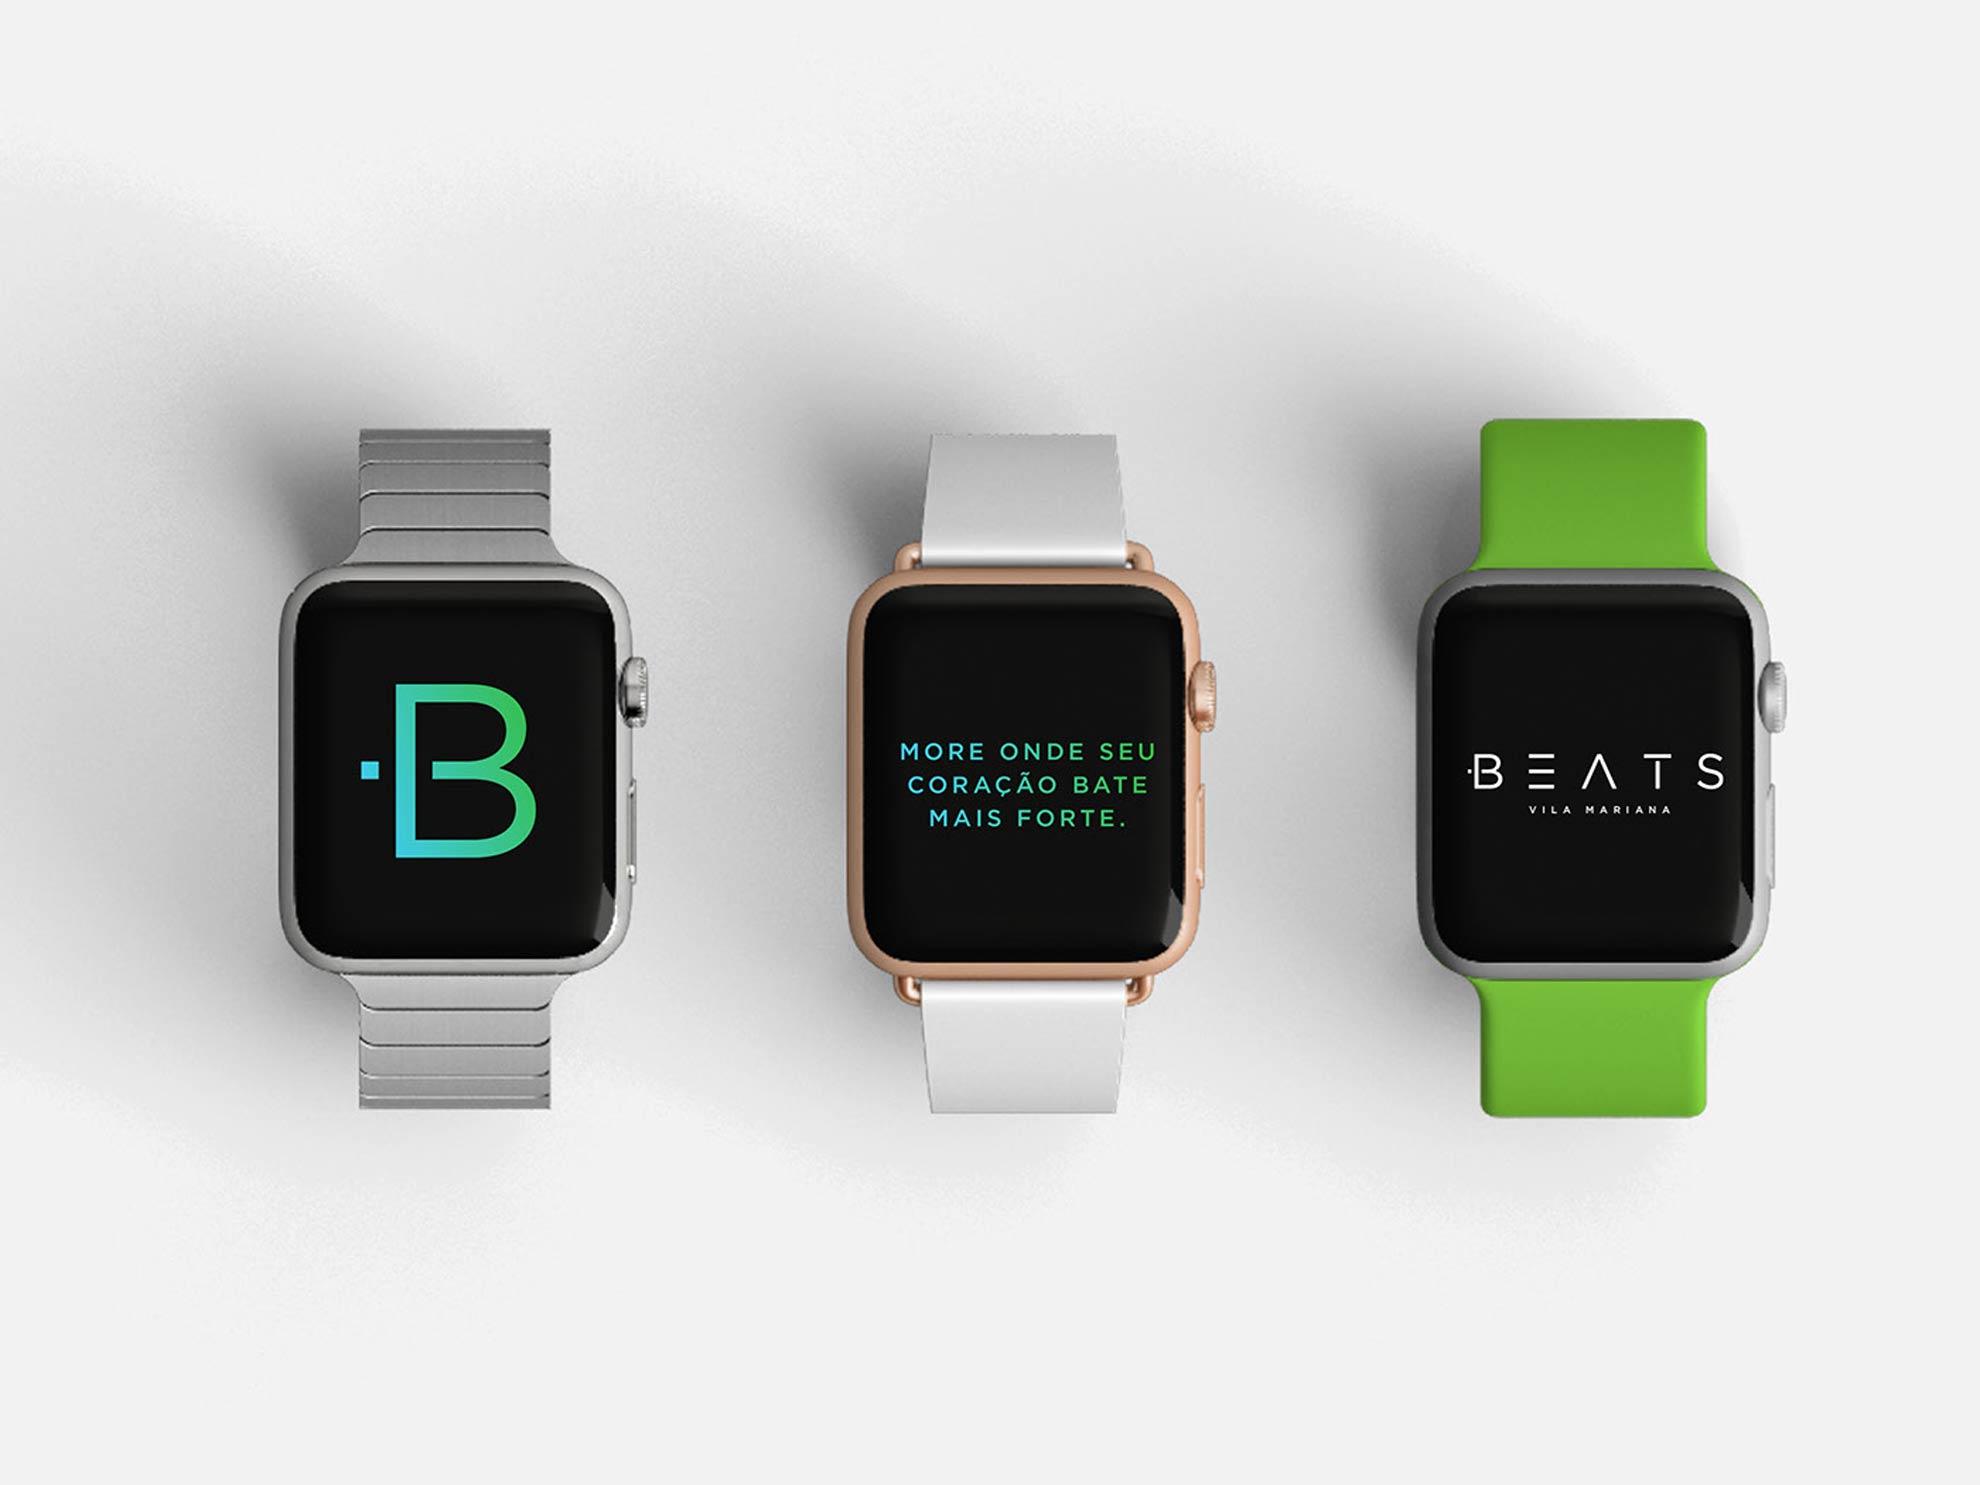 beats-ramonmaia-design-portfolio_15